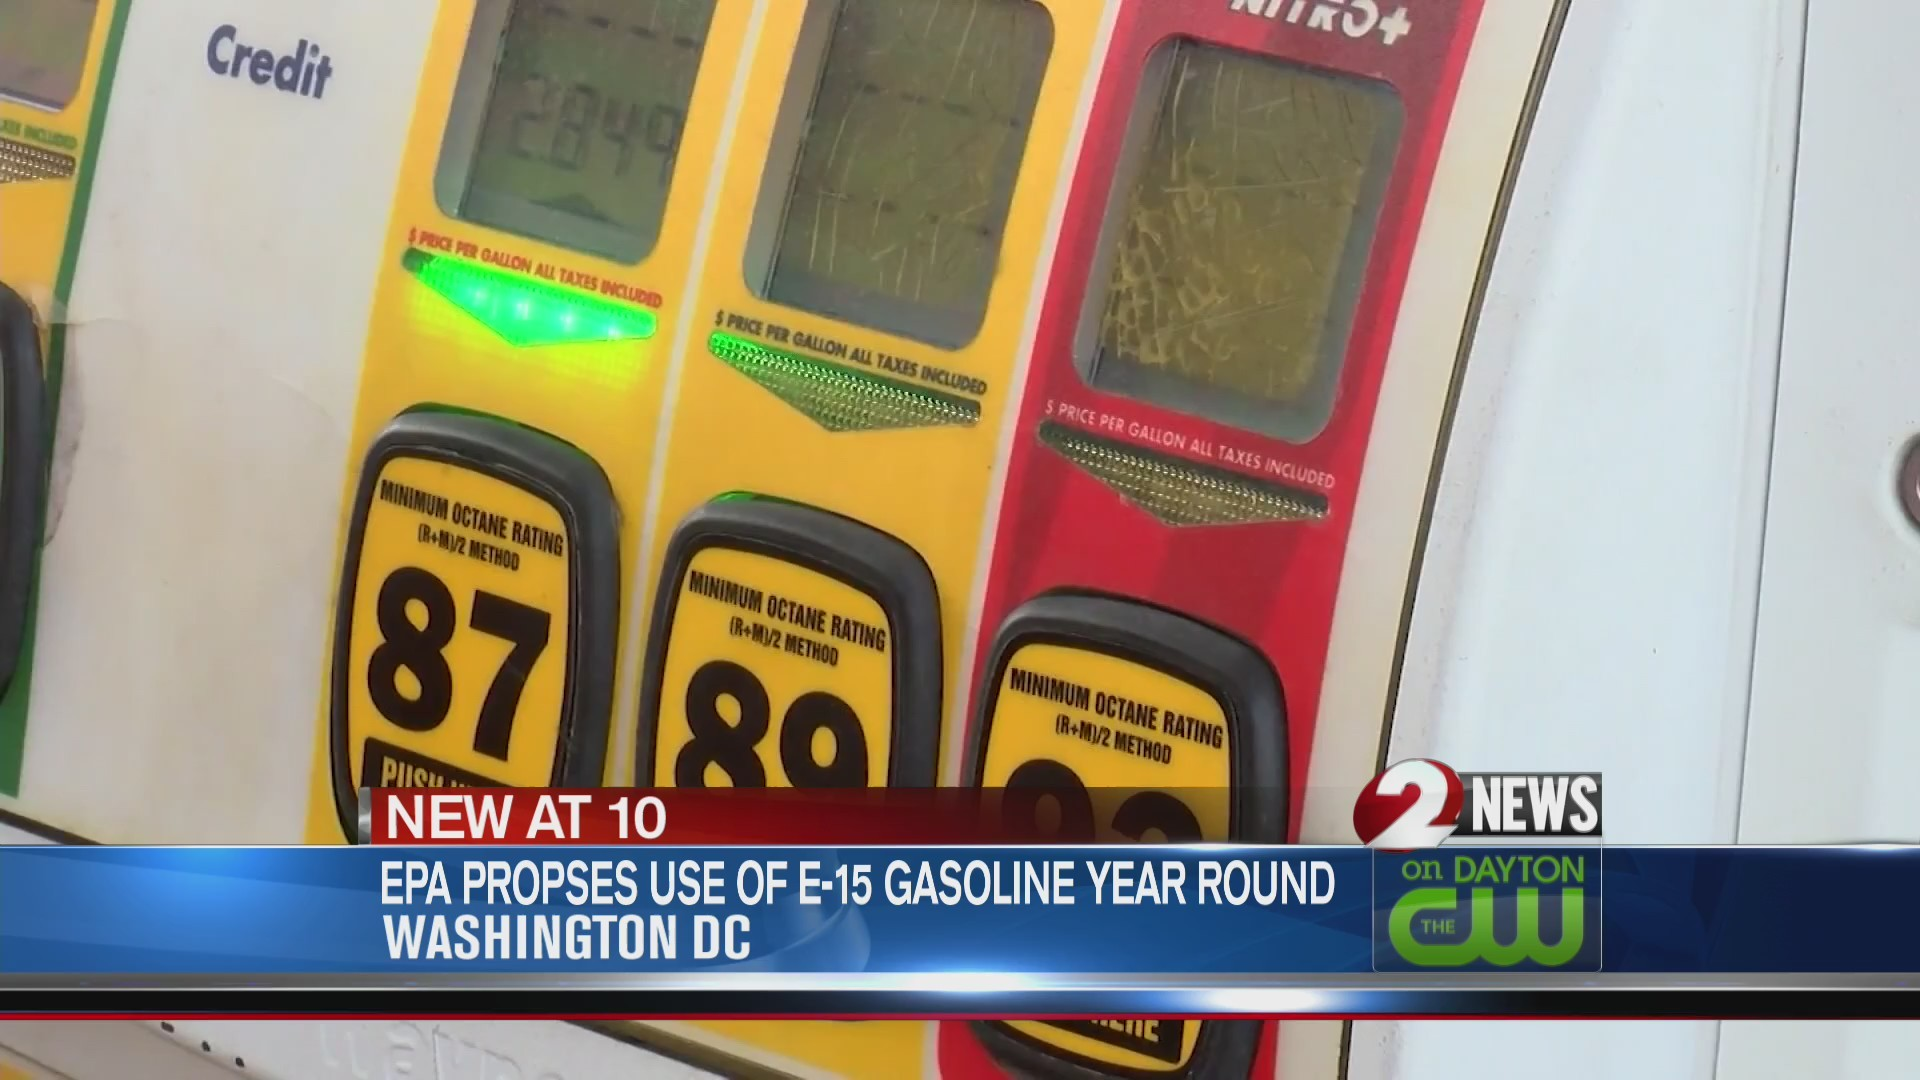 EPA proposes use of E-15 gasoline year round